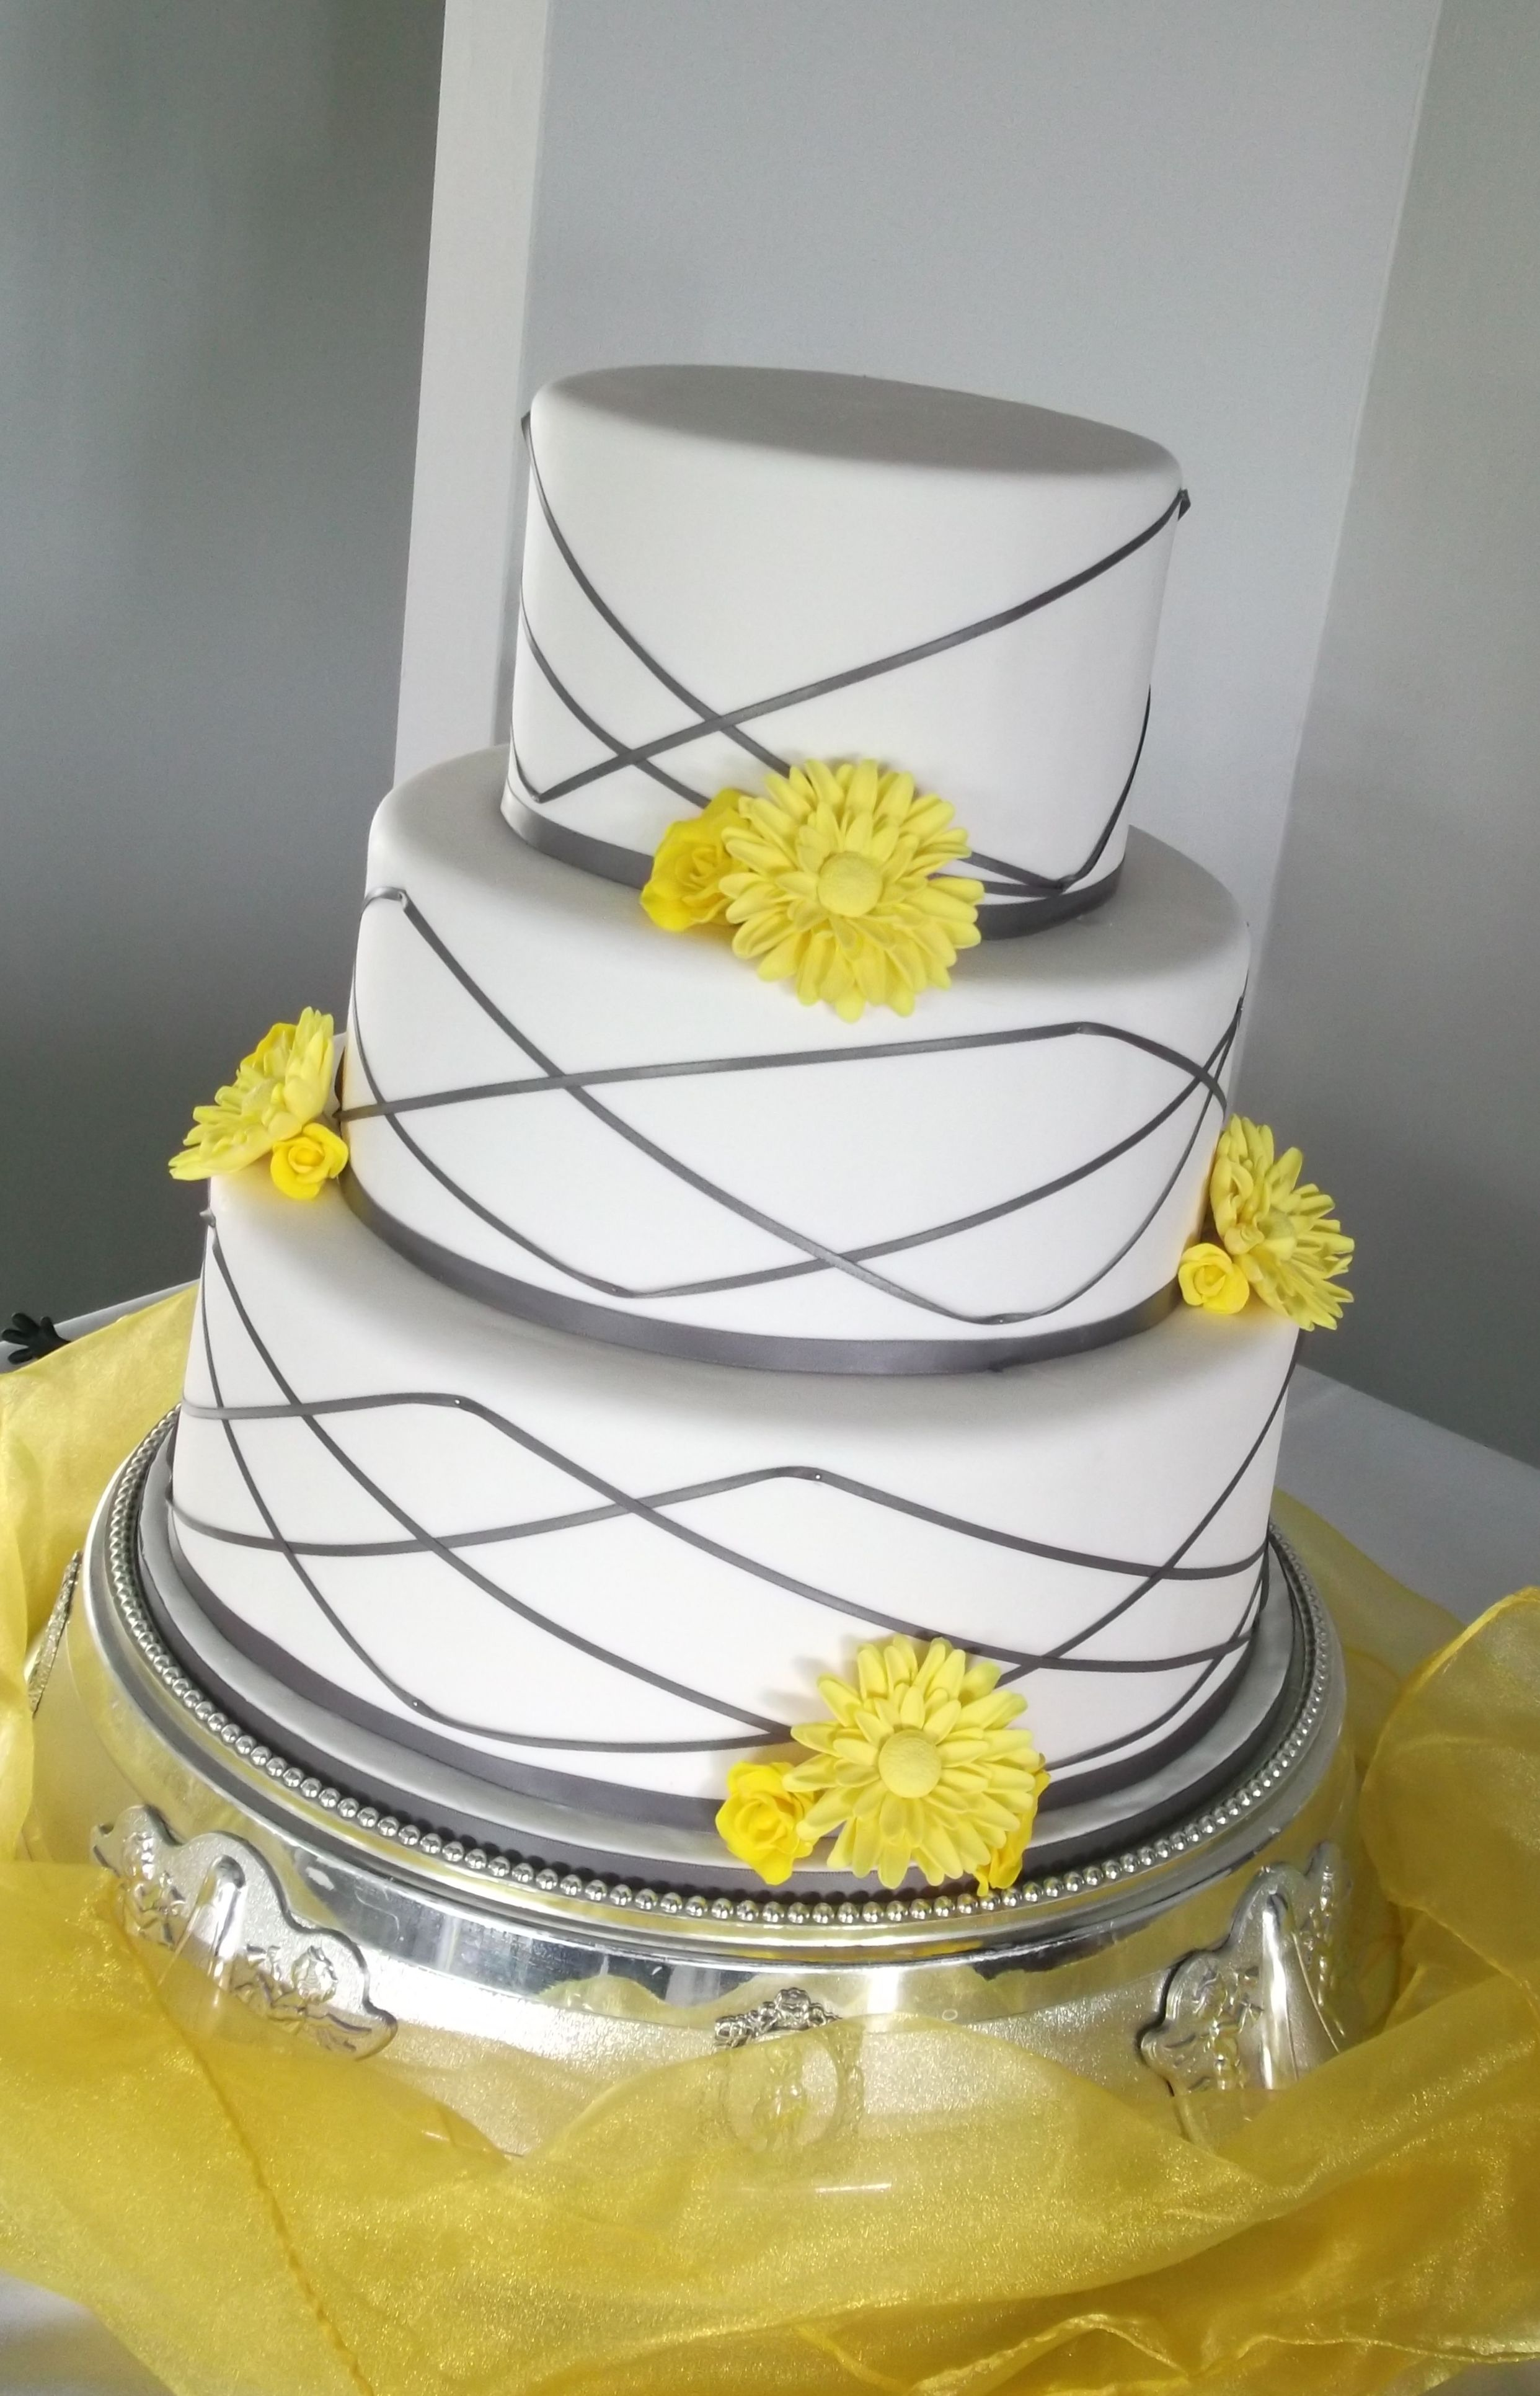 Wedding decorations yellow and gray  Yellow and grey wedding cake  Wedding ideas  Pinterest  Wedding